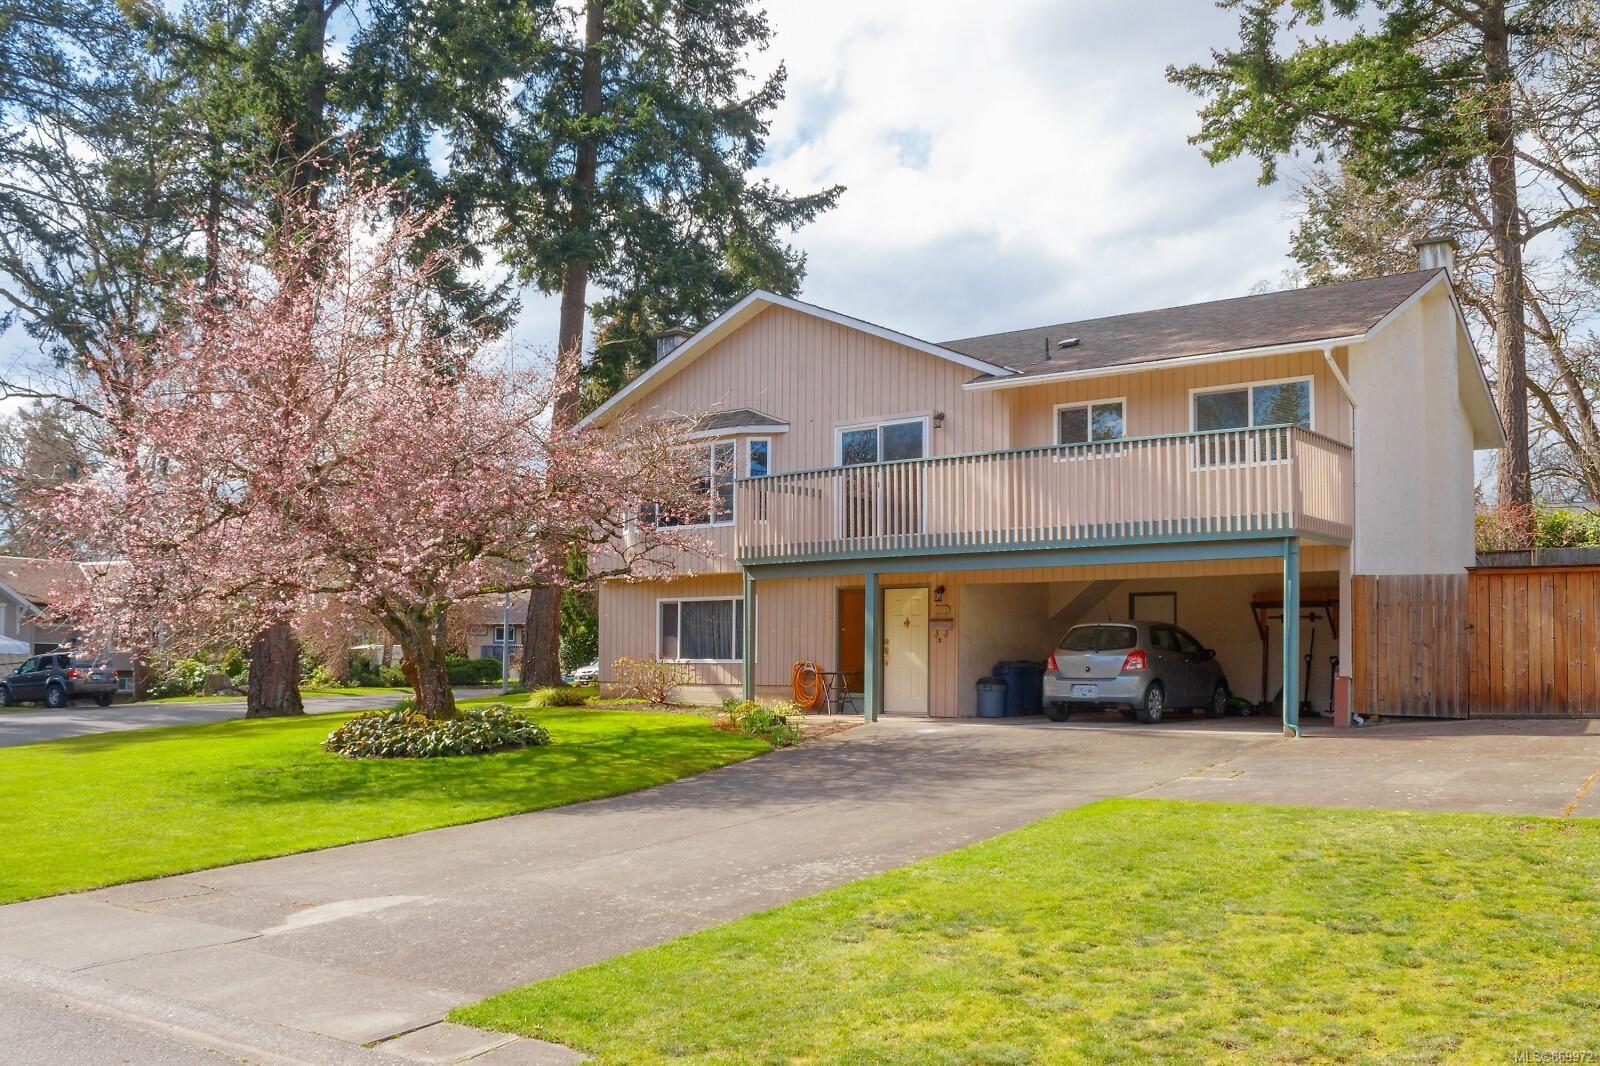 Main Photo: 1070 Baldwin Pl in : SE Lake Hill House for sale (Saanich East)  : MLS®# 869972